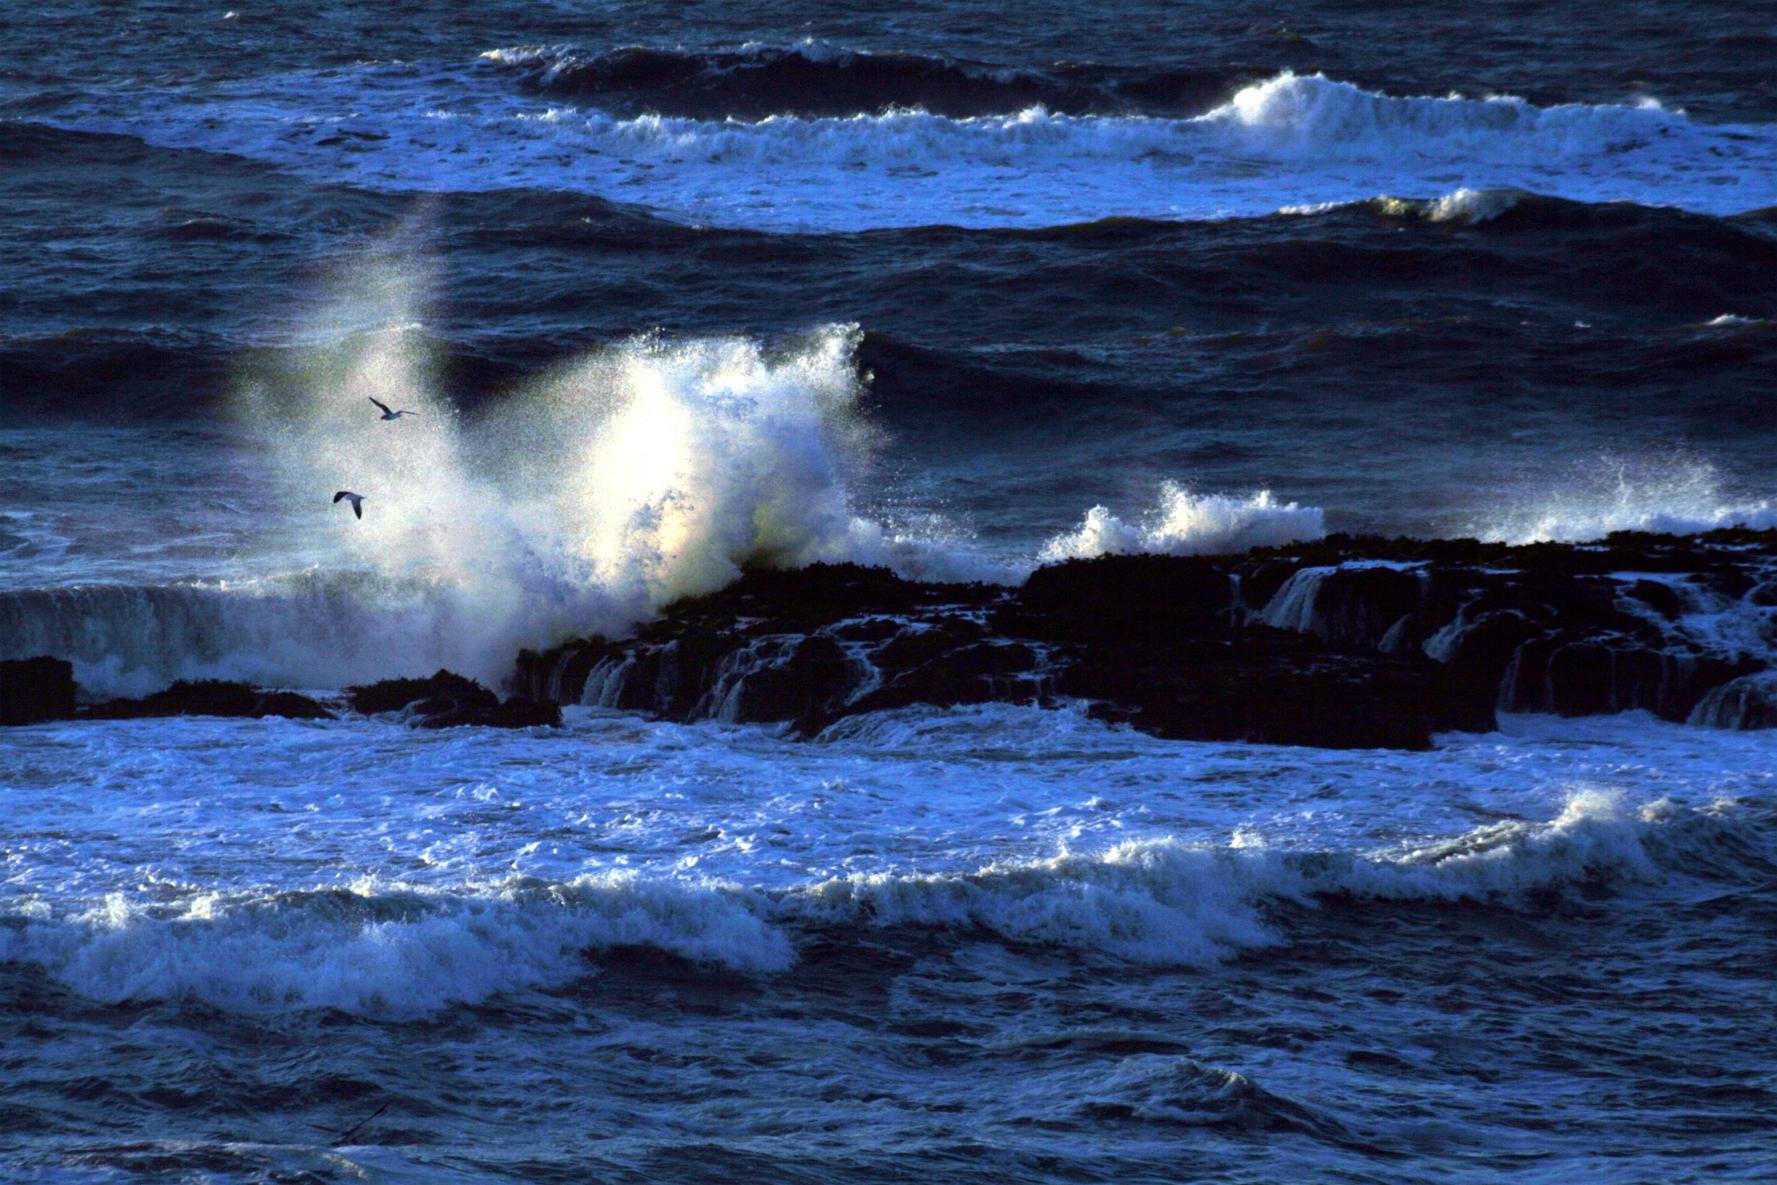 FilePacific ocean 5.jpg Wikimedia Commons